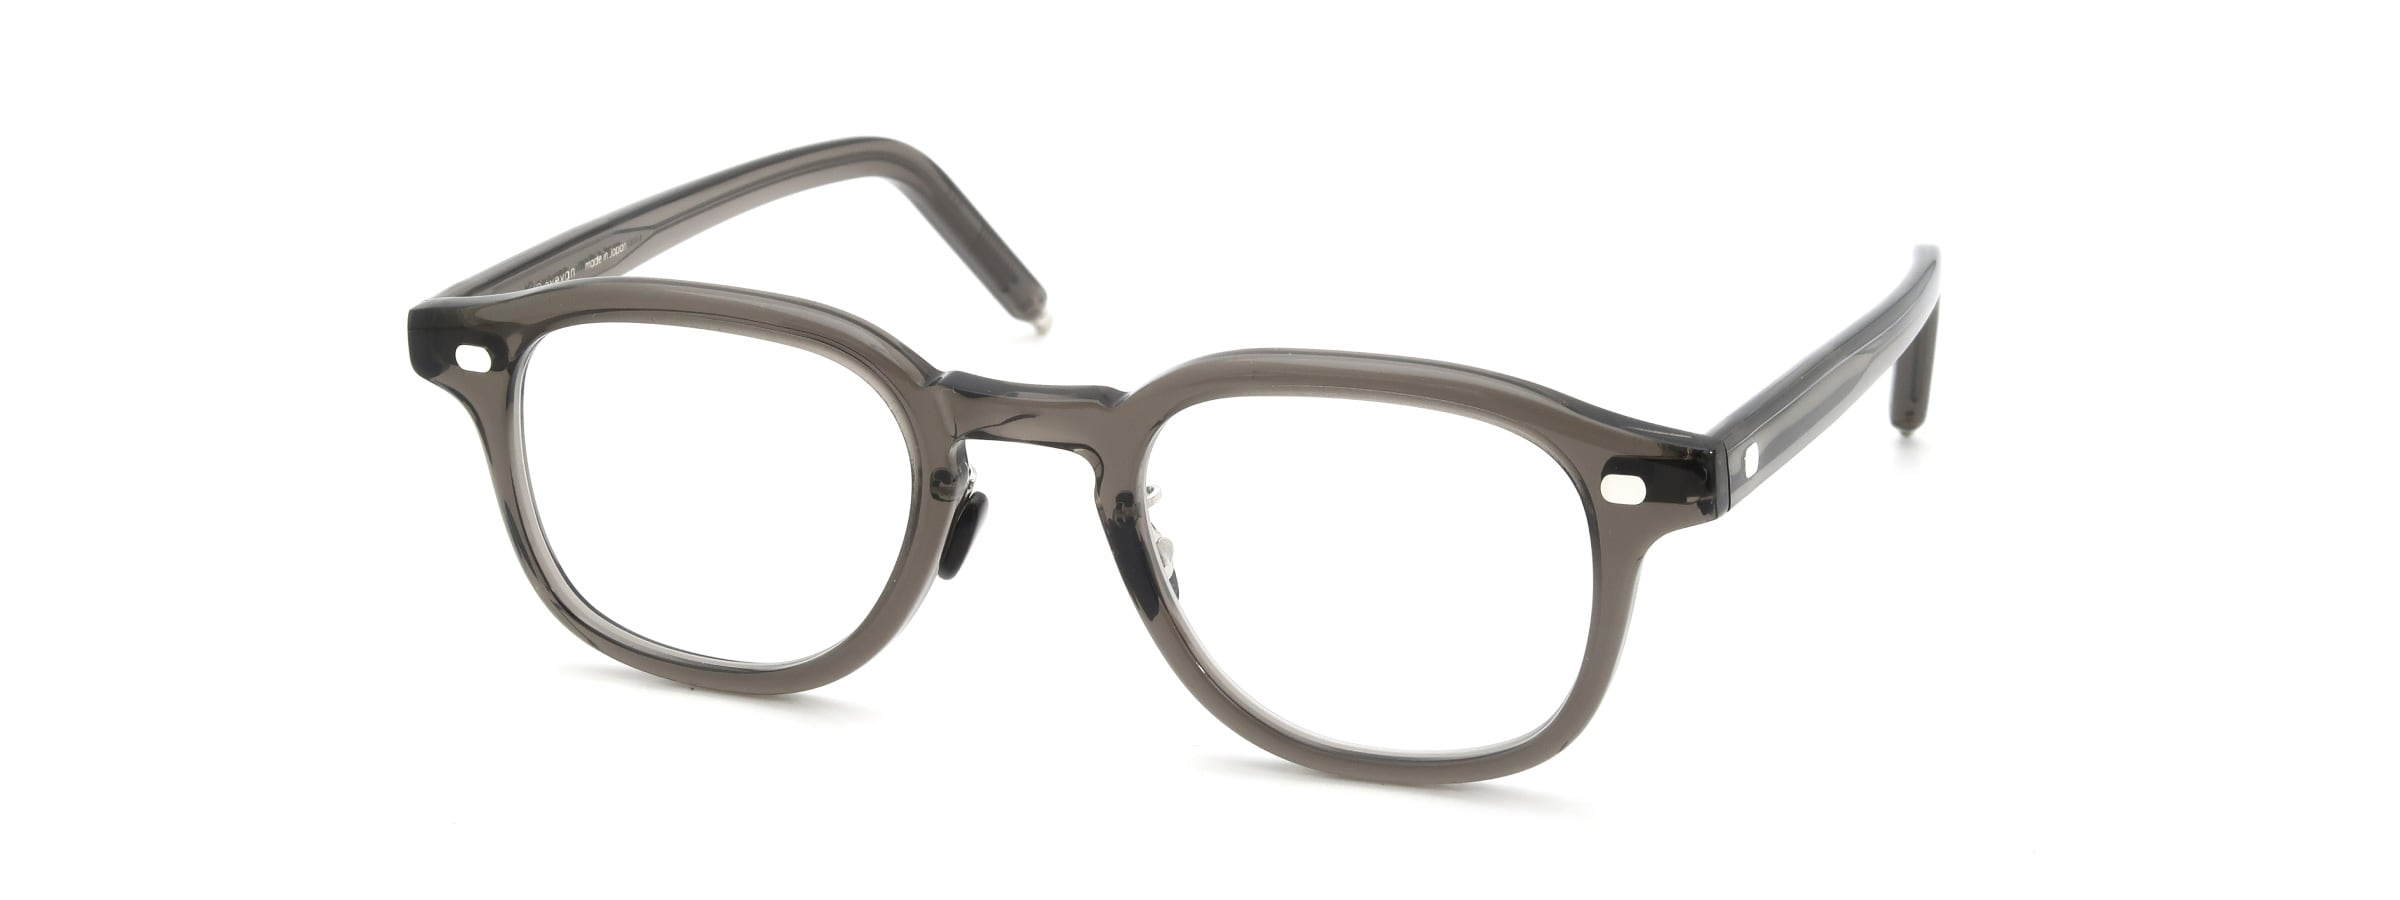 10 eyevan NO.7 Ⅲ FR 47size c.1011S Grey全体像